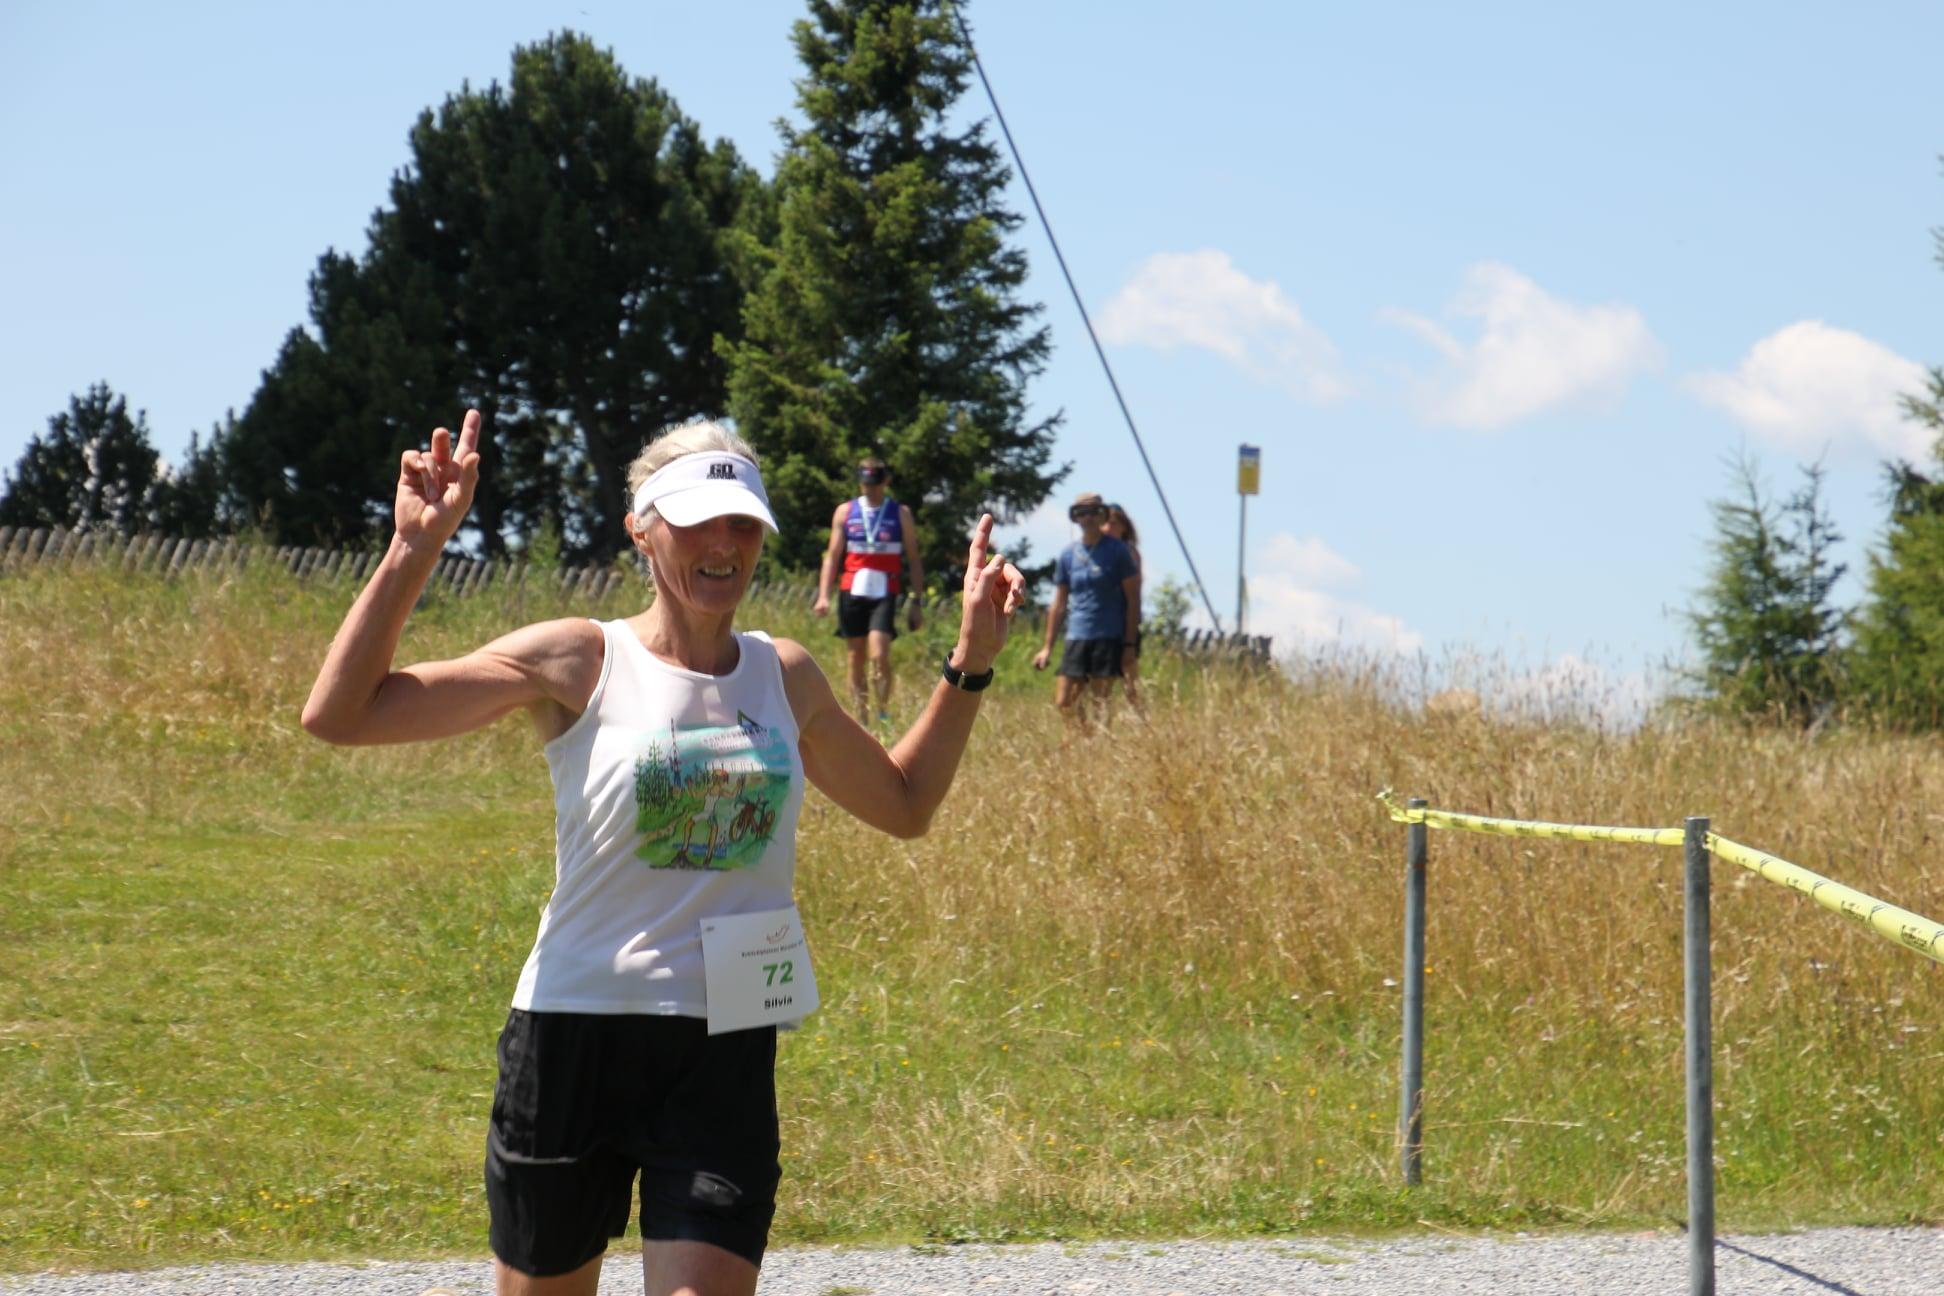 Laufen -rtr-weiz-116588268_3809031292457976_3895961479158837311_o-Schöcklplateau-Marathon 2020